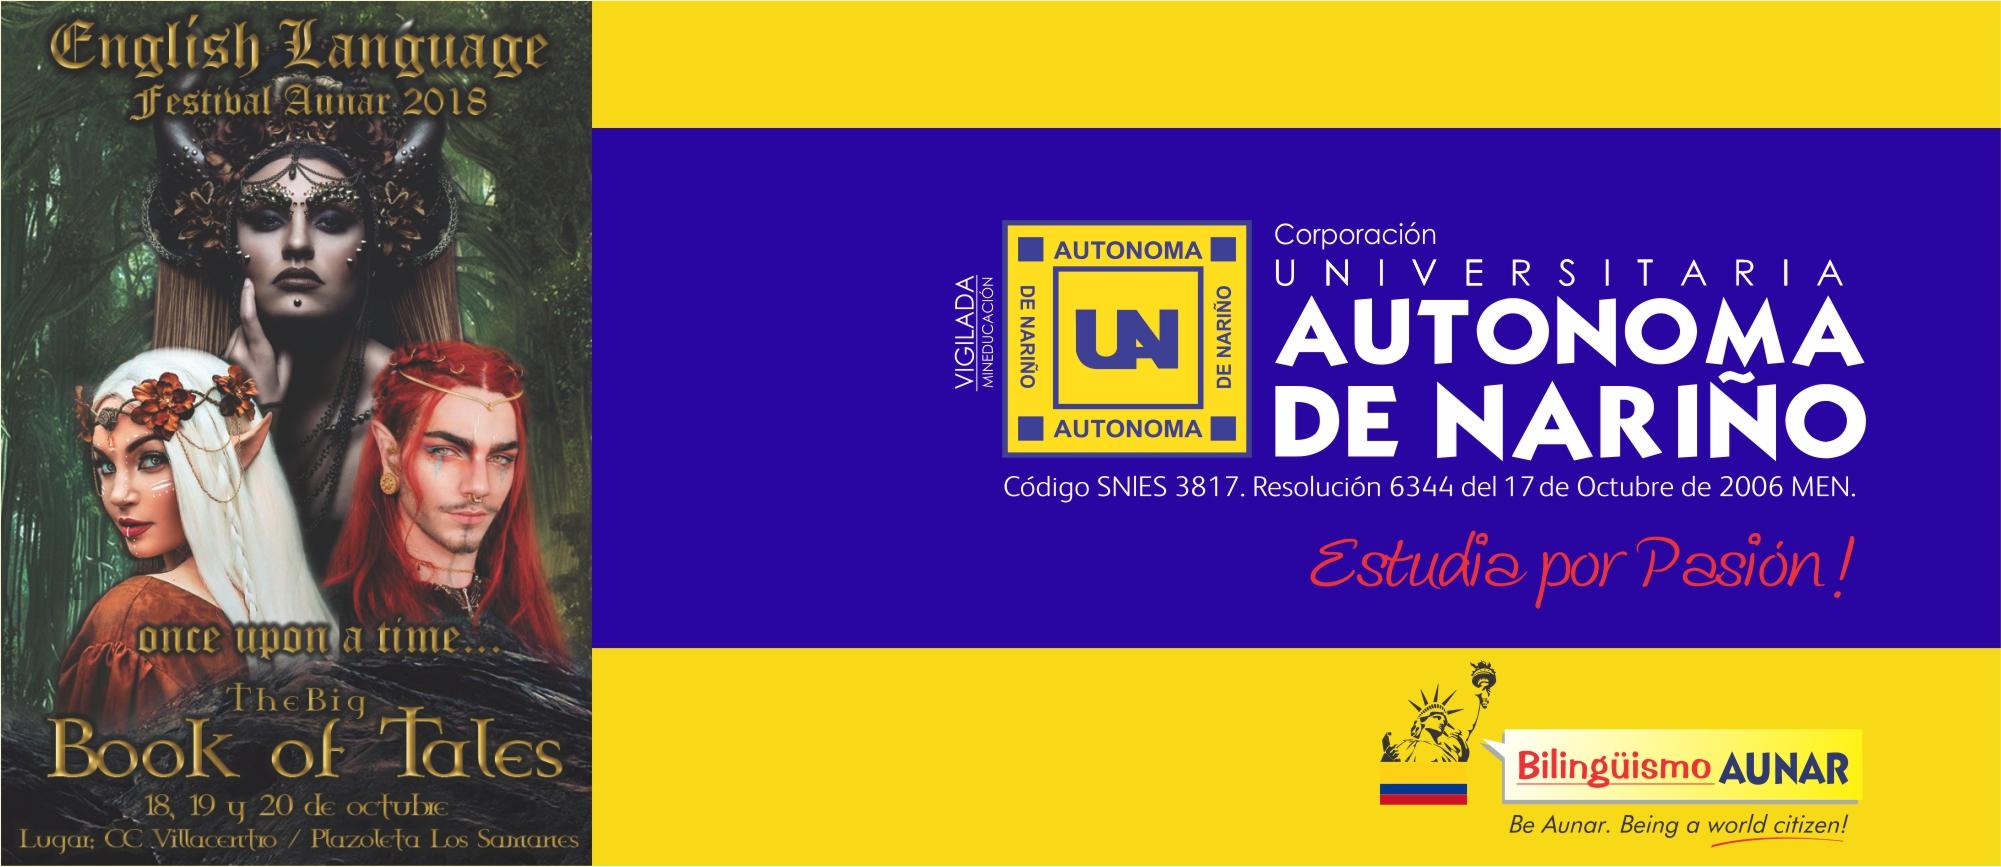 ENGLISH LANGUAGE FESTIVAL AUNAR 2018